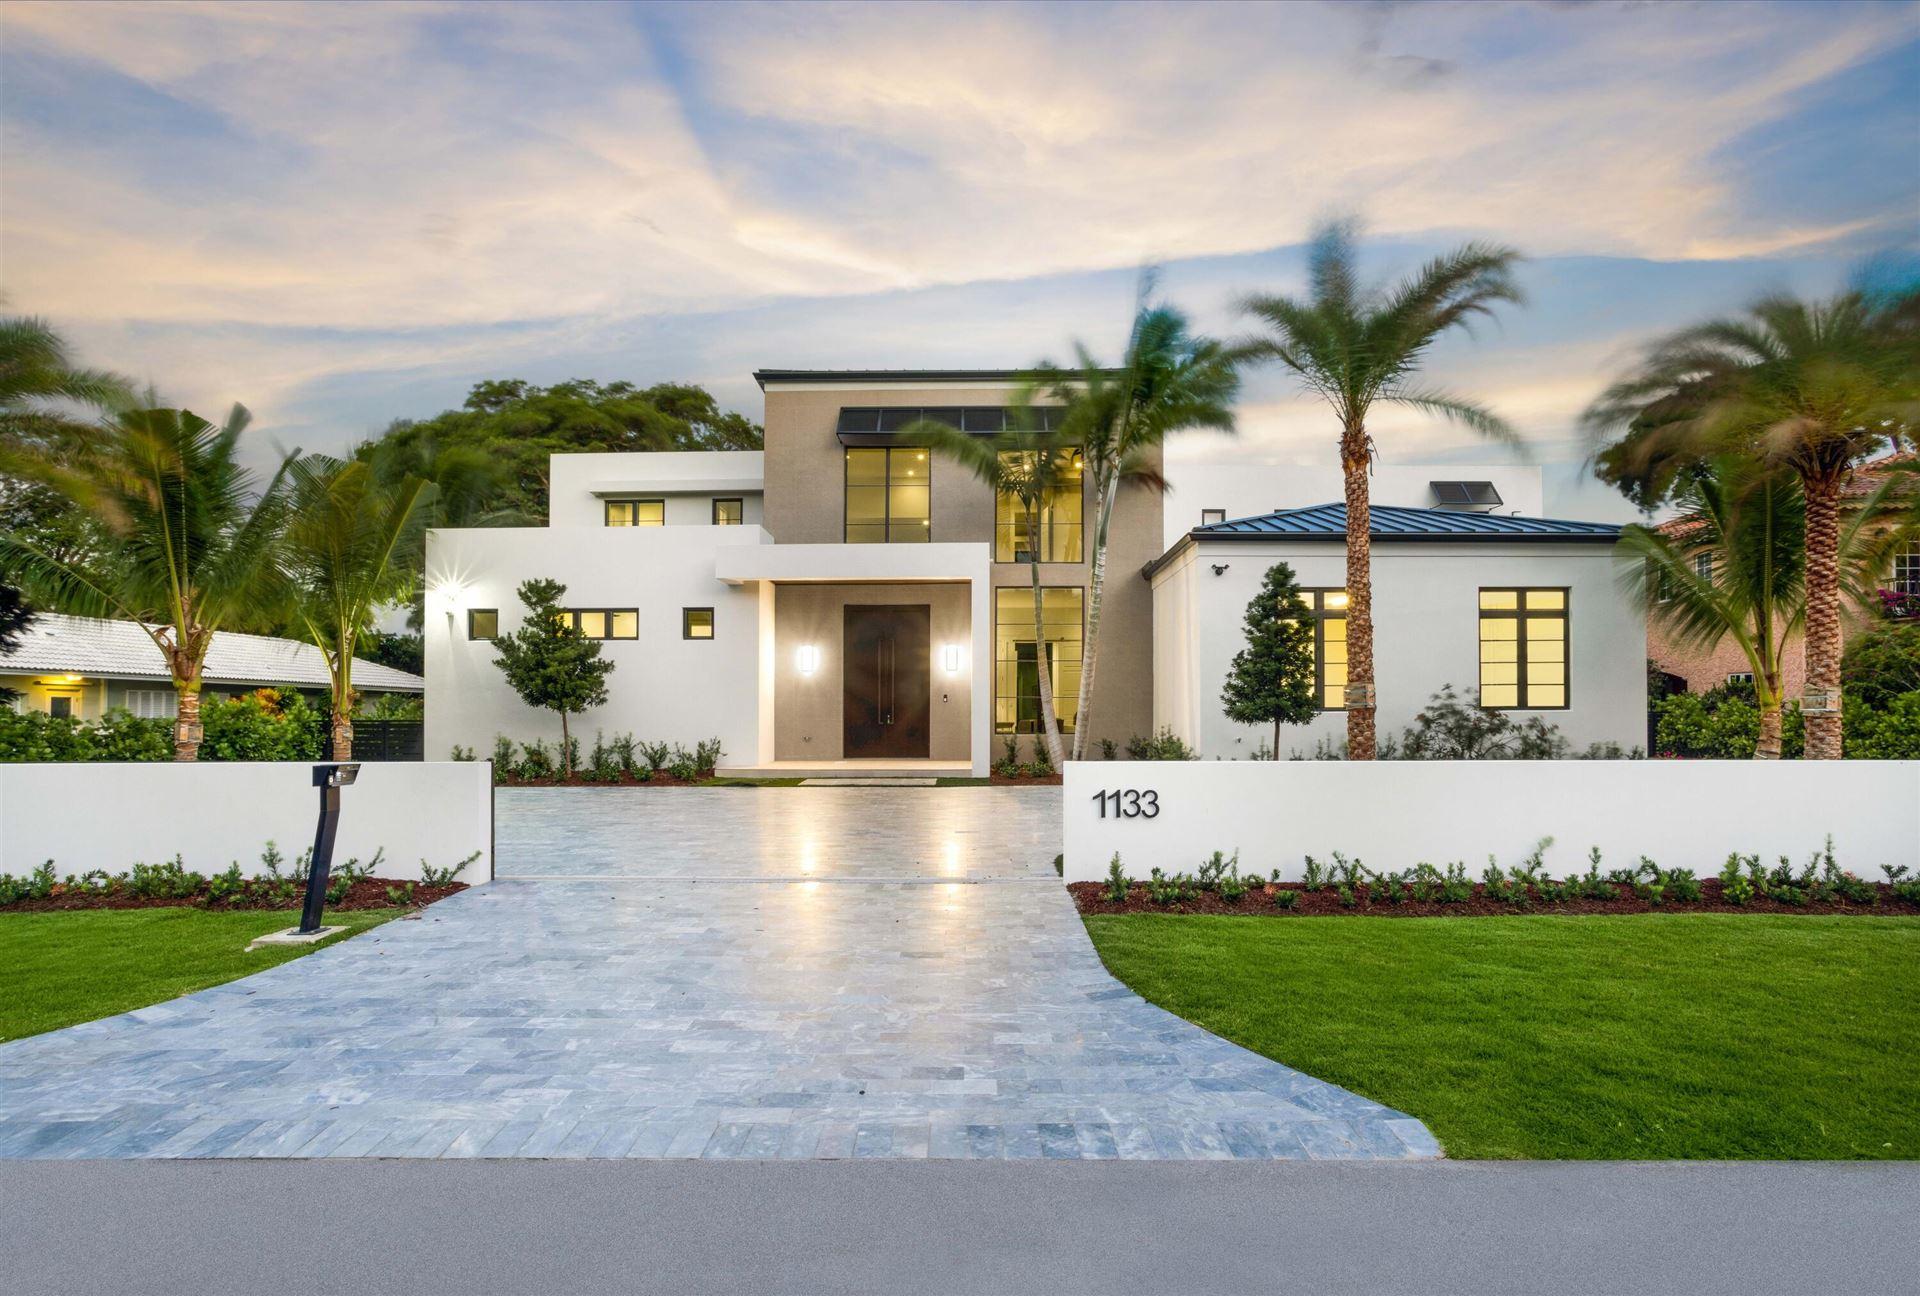 1133 Cocoanut Road, Boca Raton, FL 33432 - MLS#: RX-10703870